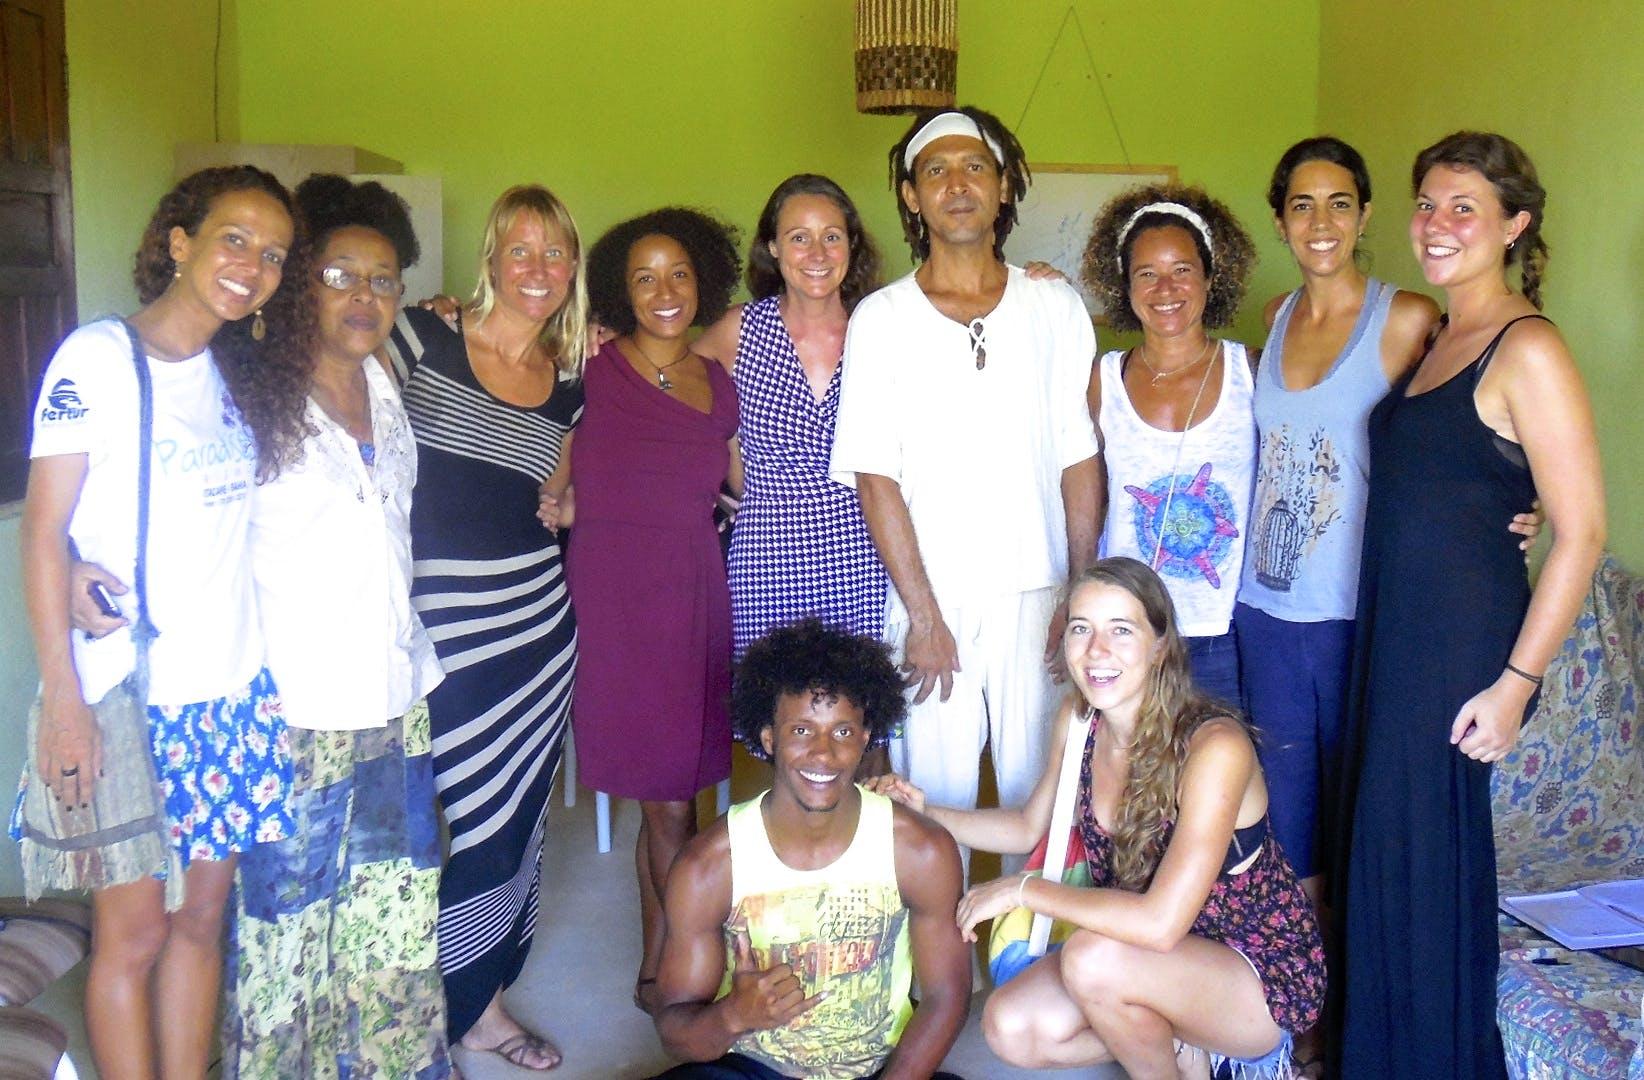 Volunteer Coordinator in Tropical Surf Town